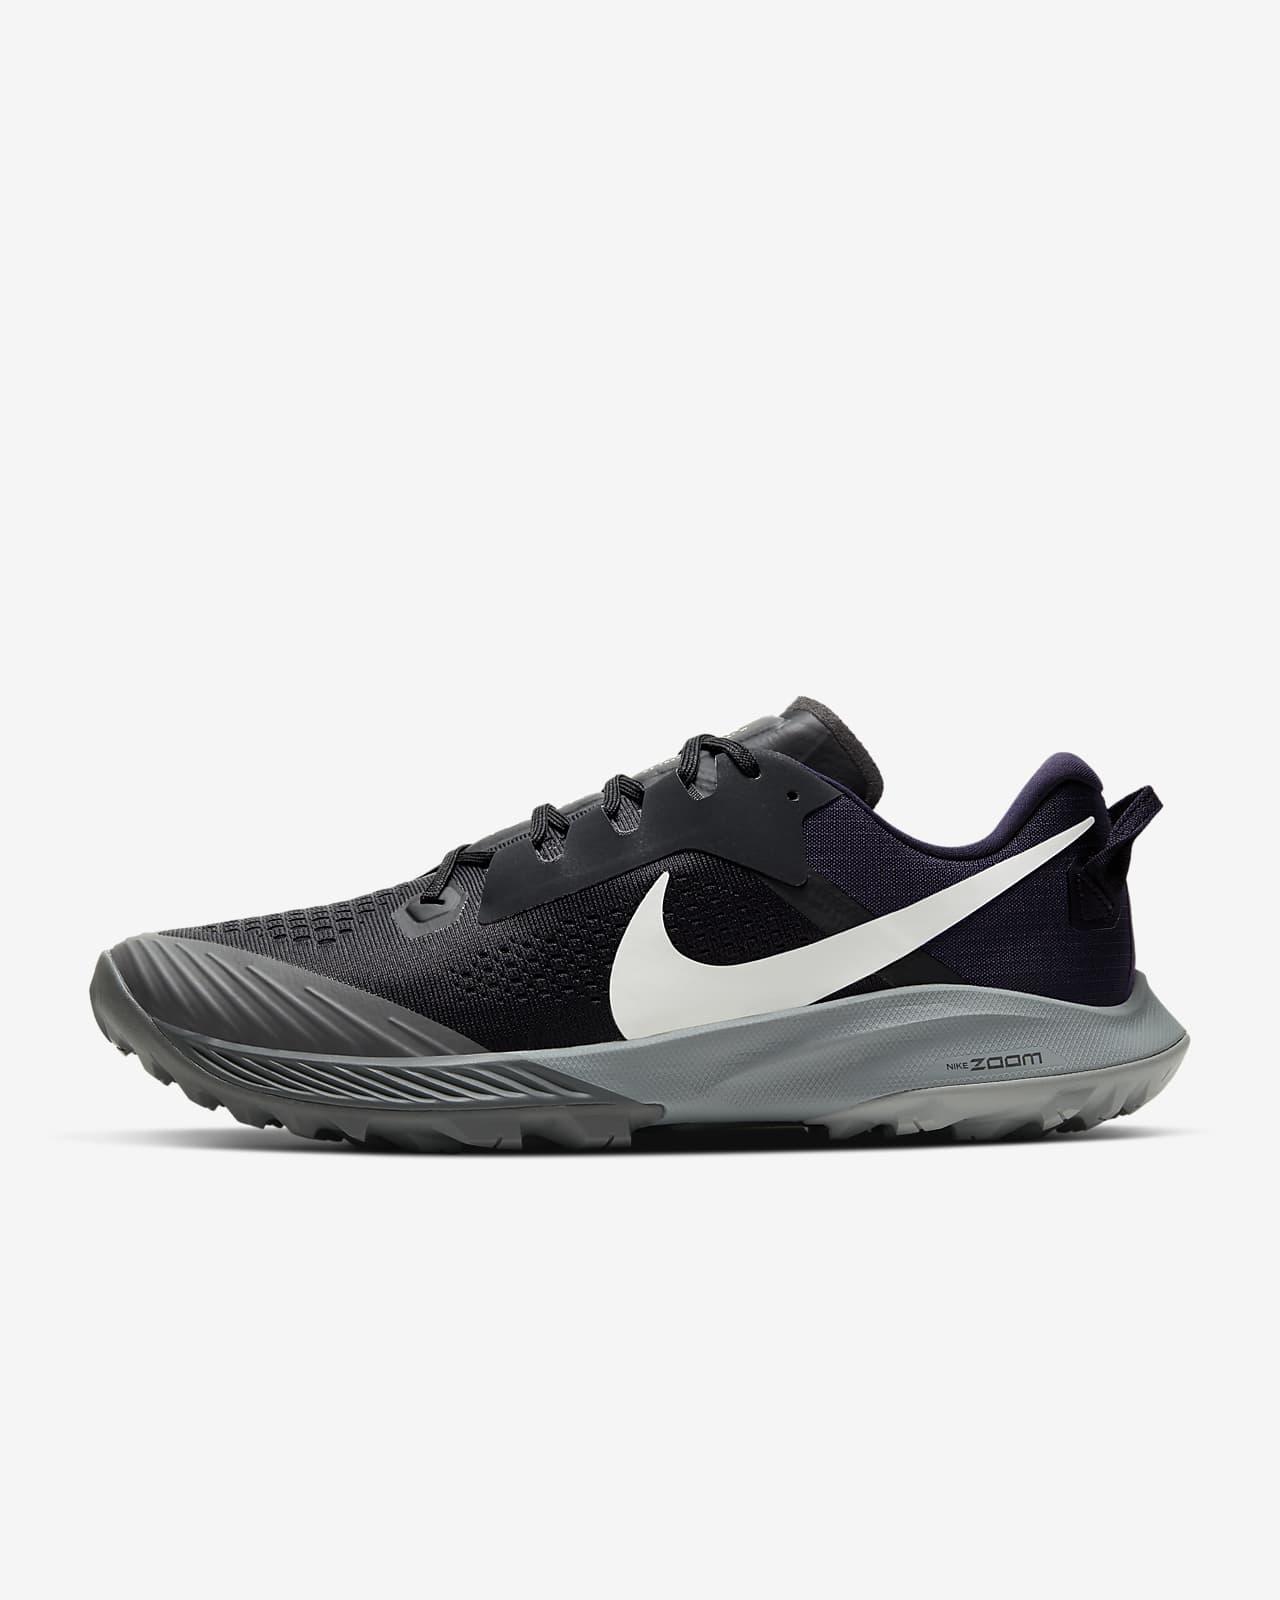 Nike Air Zoom Terra Kiger 6 Men's Trail